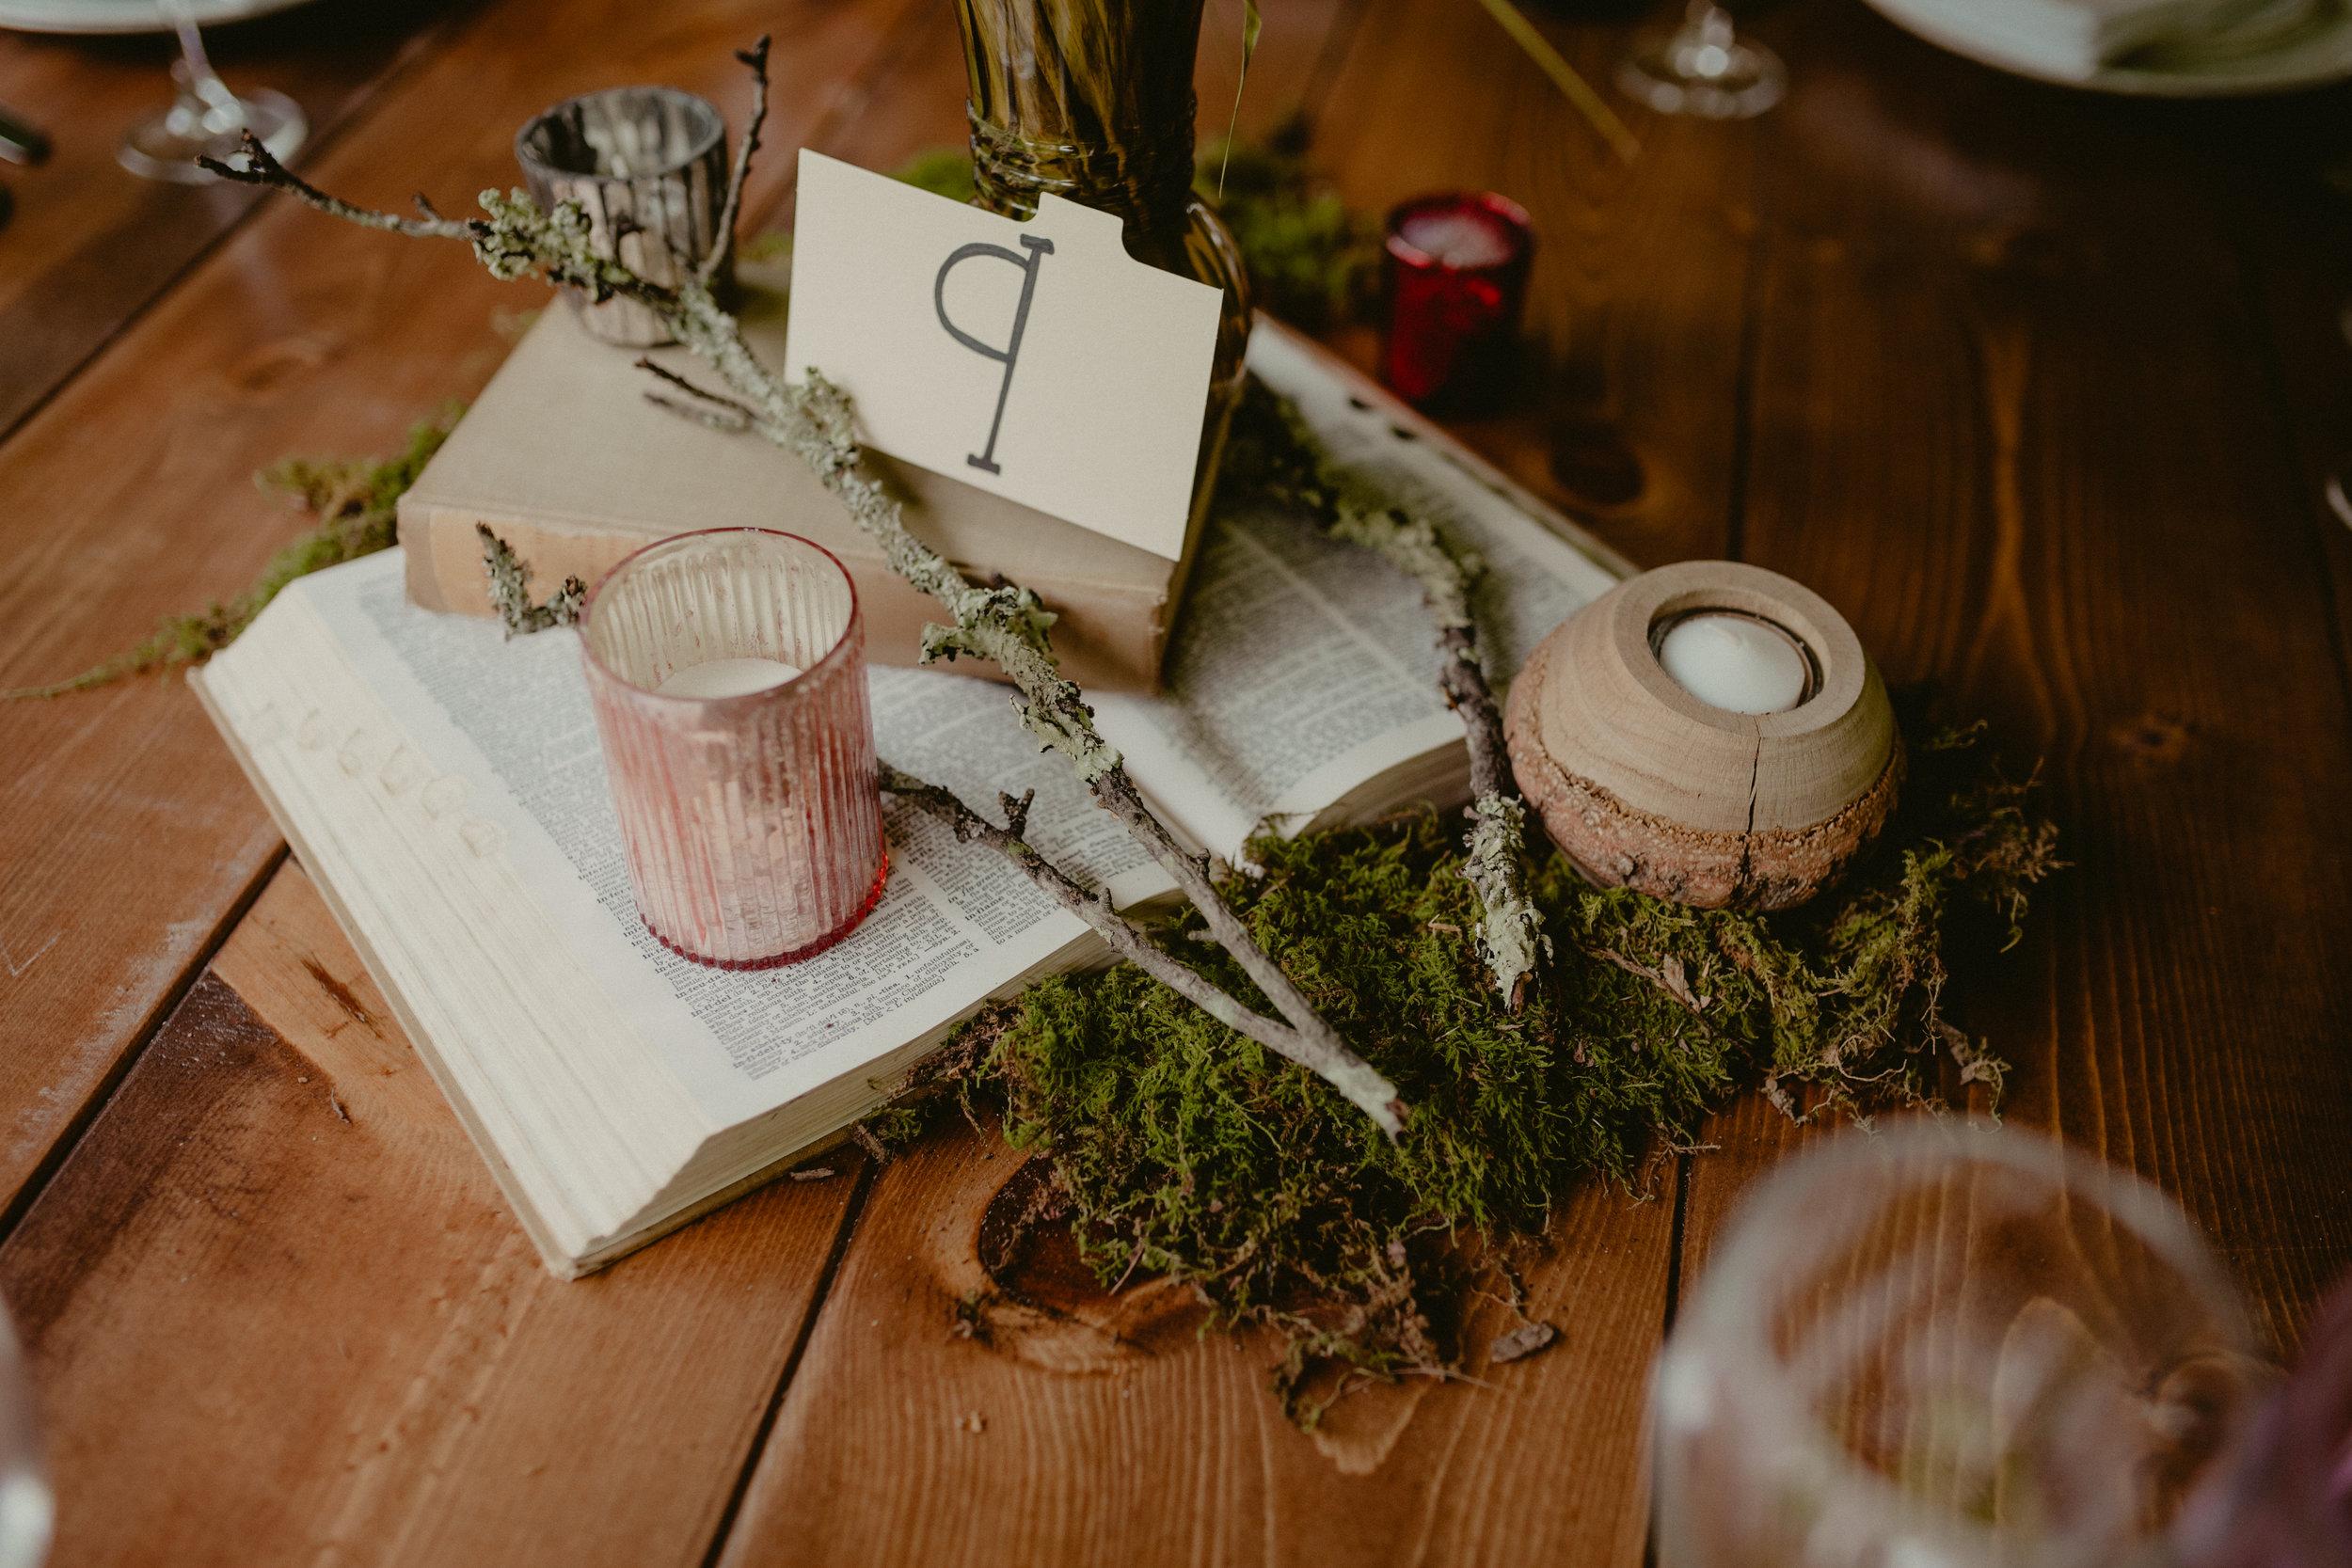 DEER_MOUNTAIN_INN_WEDDING_CHELLISE_MICHAEL_PHOTOGRAPHY-1299.jpg